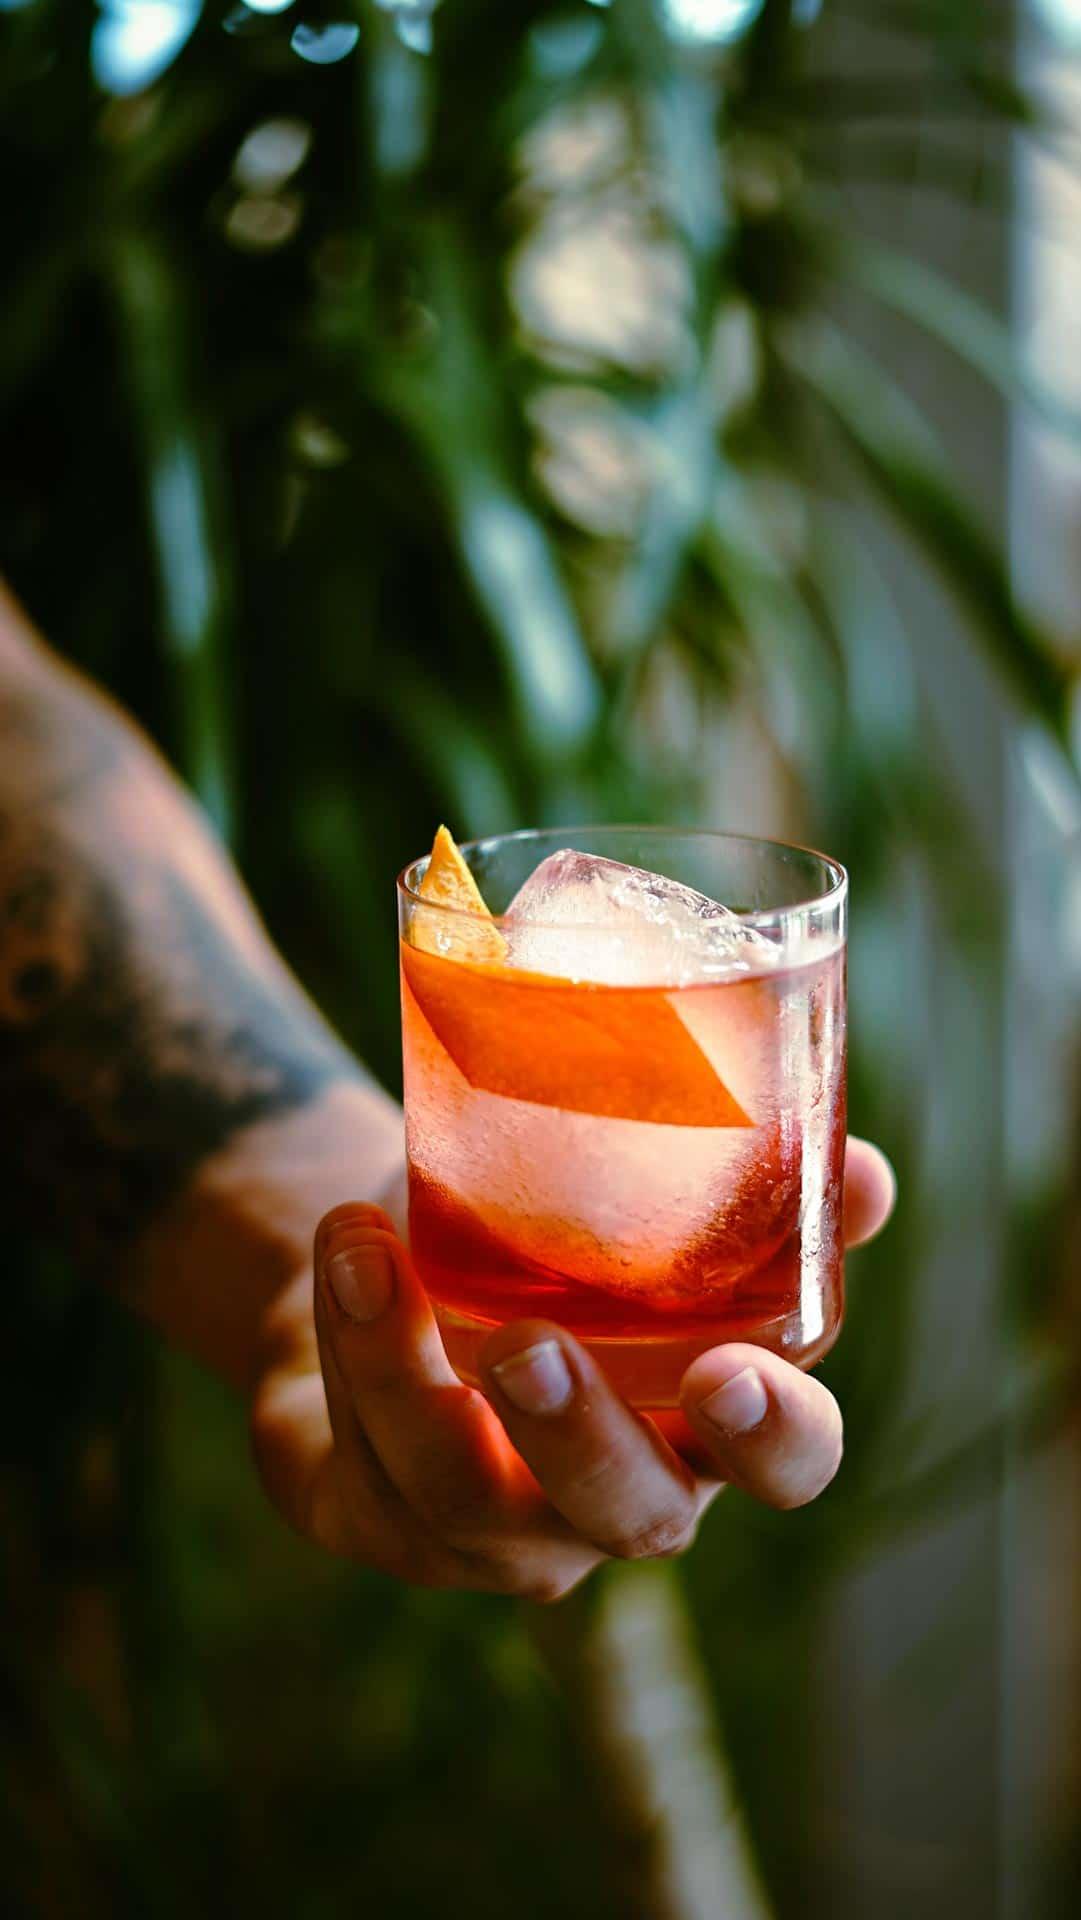 drinks 04 Droite - Drinks